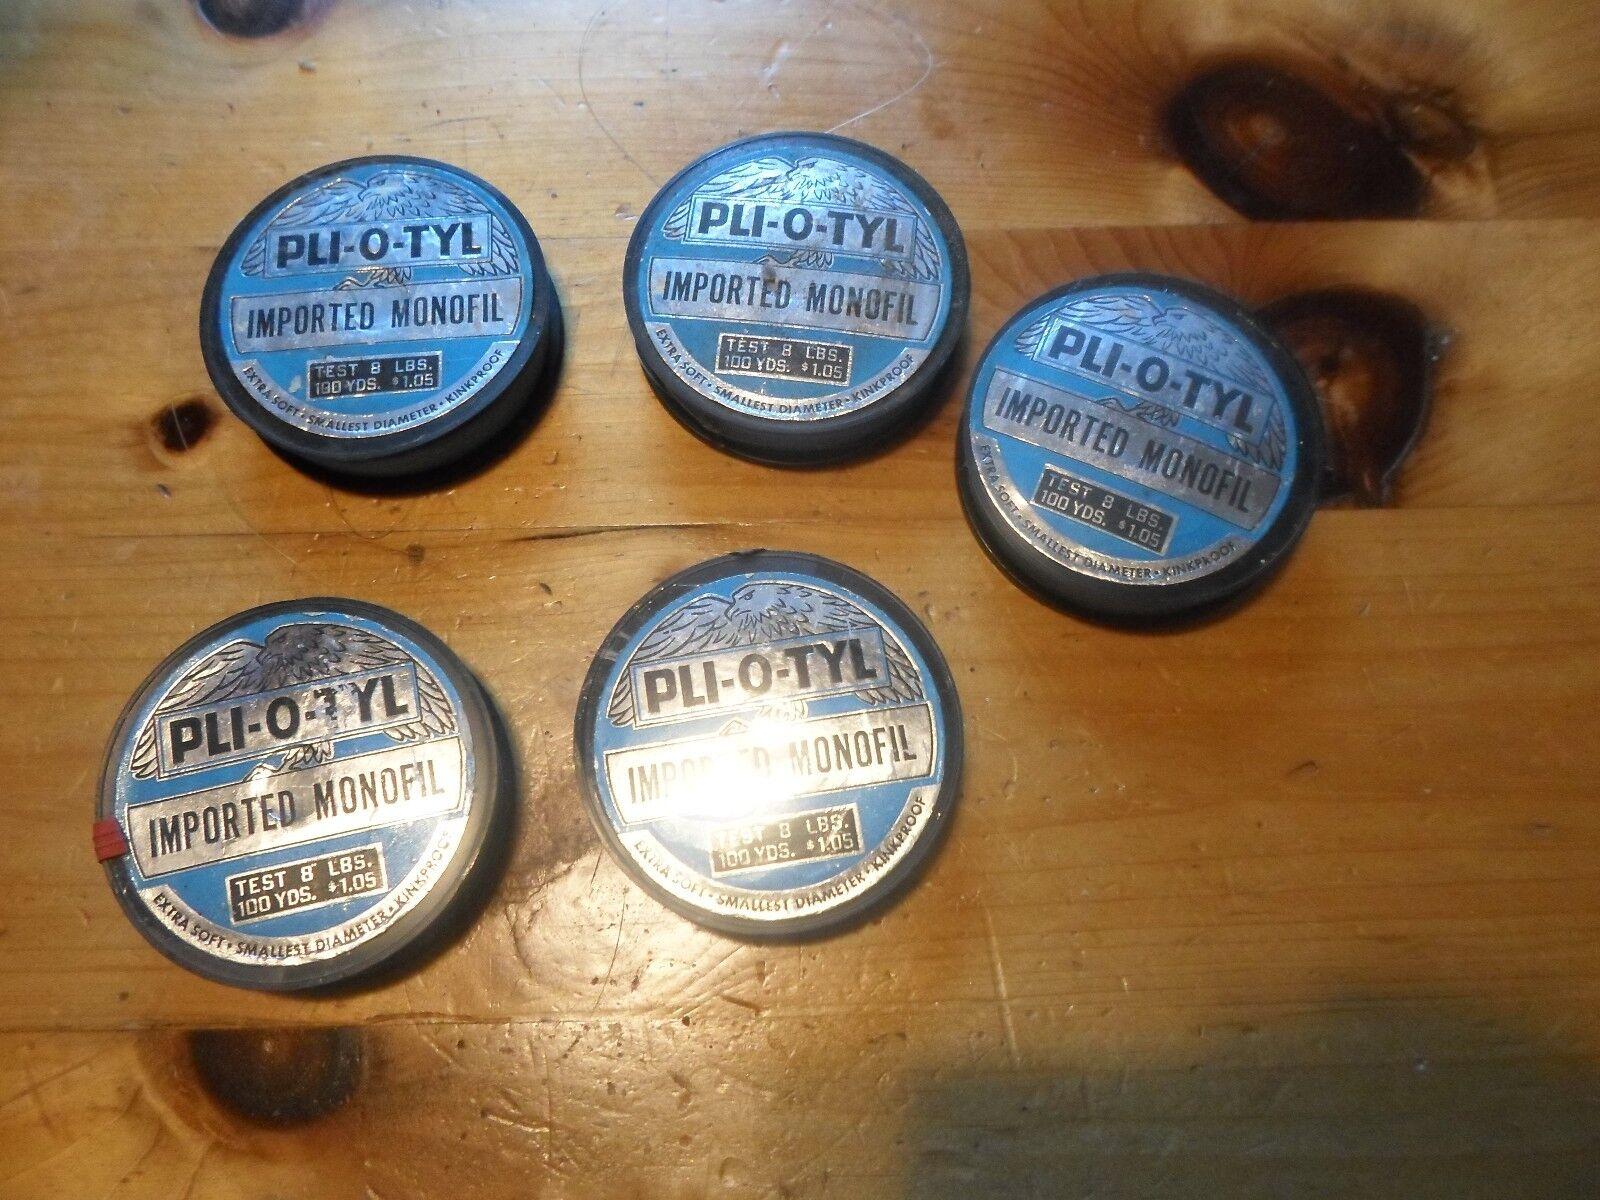 Lot of 5 Pli-o-Tyl imported Monofil 8 pound test fishing Line RARE